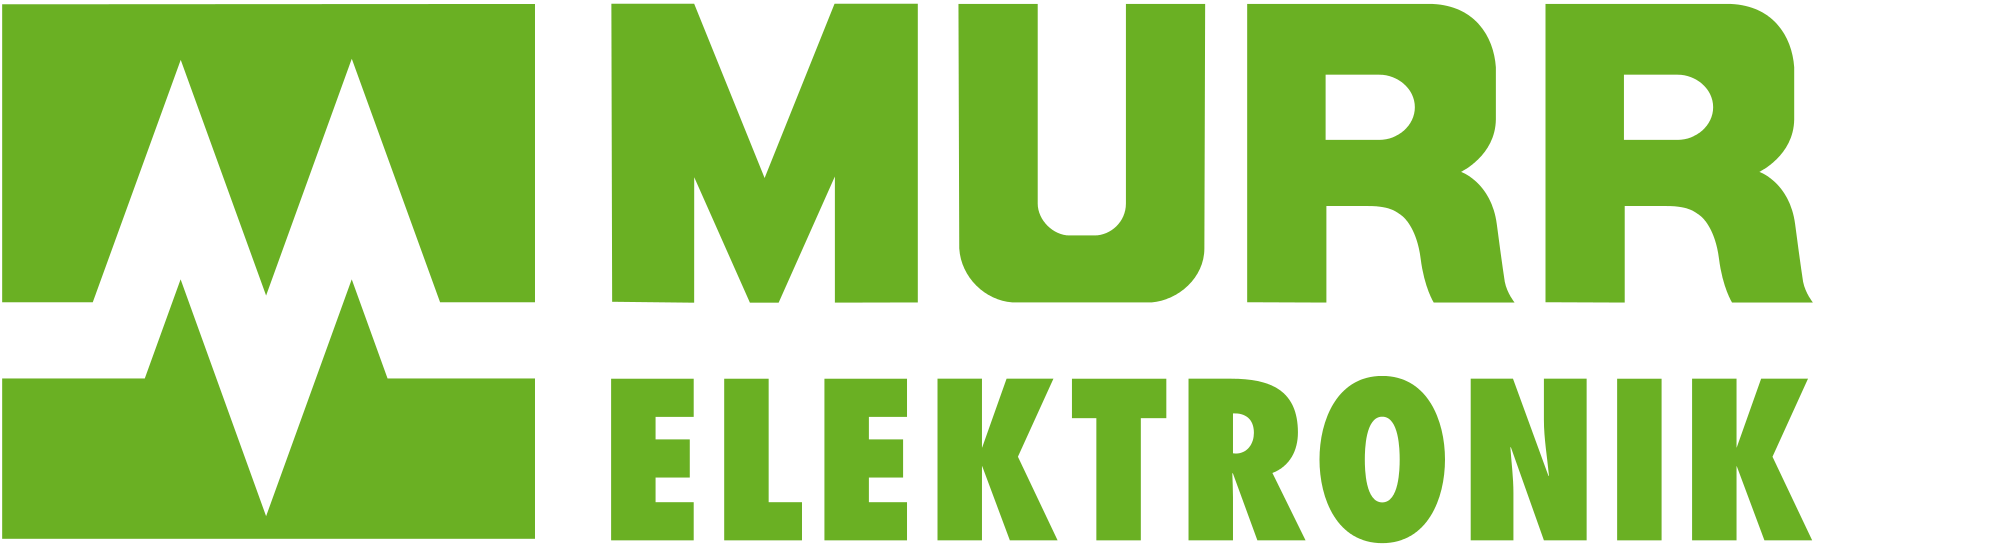 murr elektronik.png